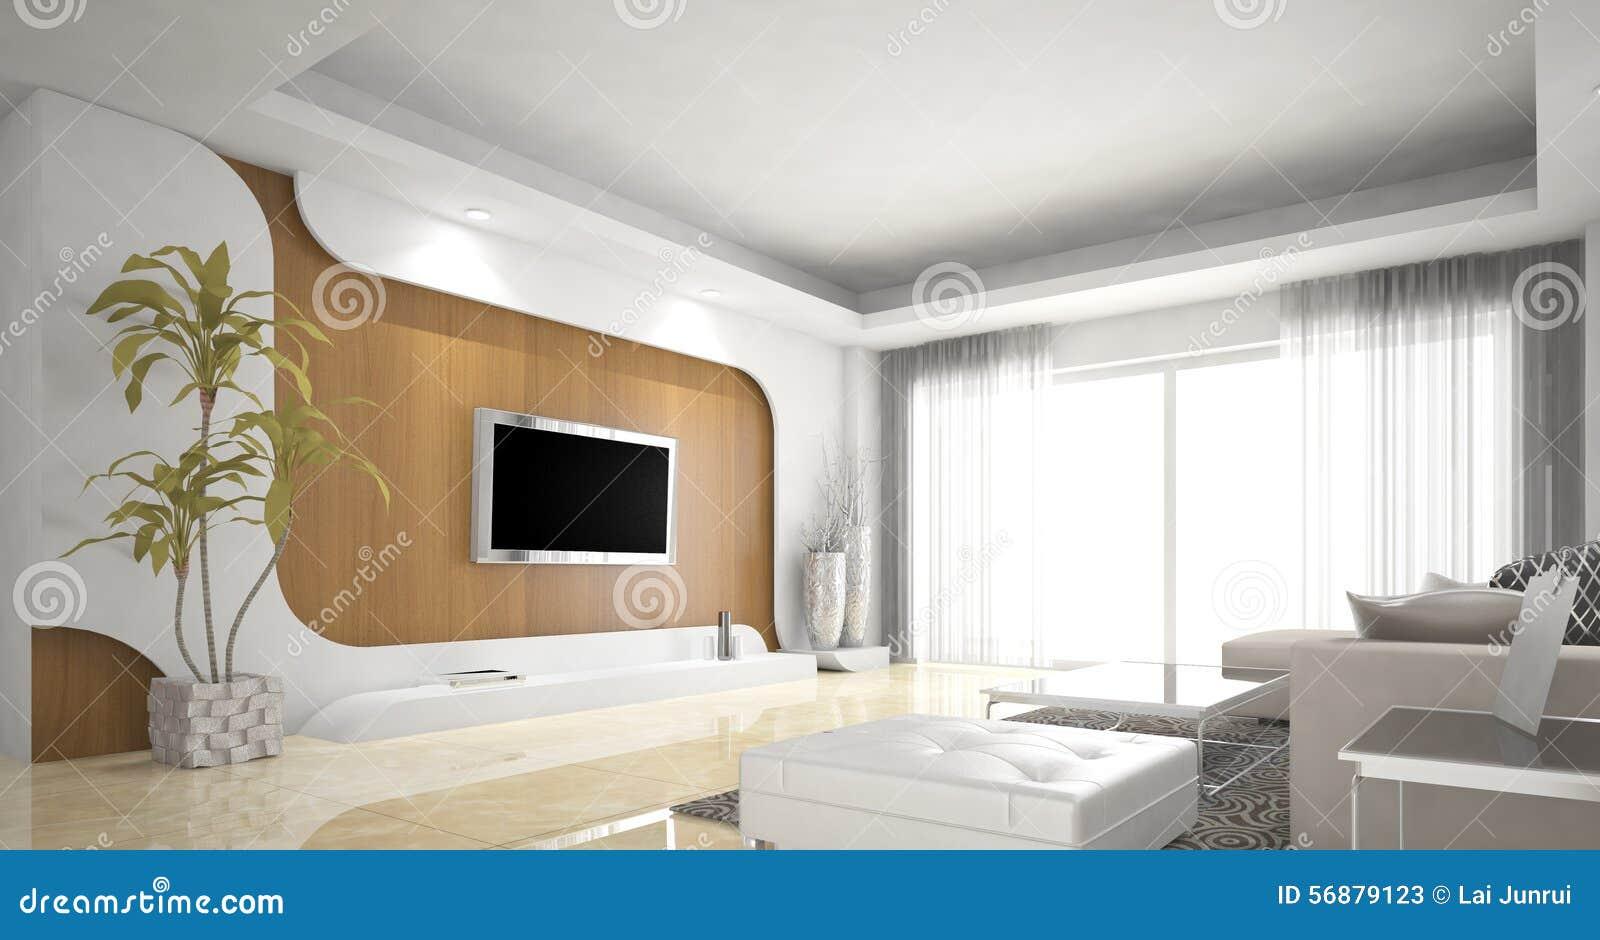 living room design europe  Living Room Design, Northern Europe Stock Illustration ...